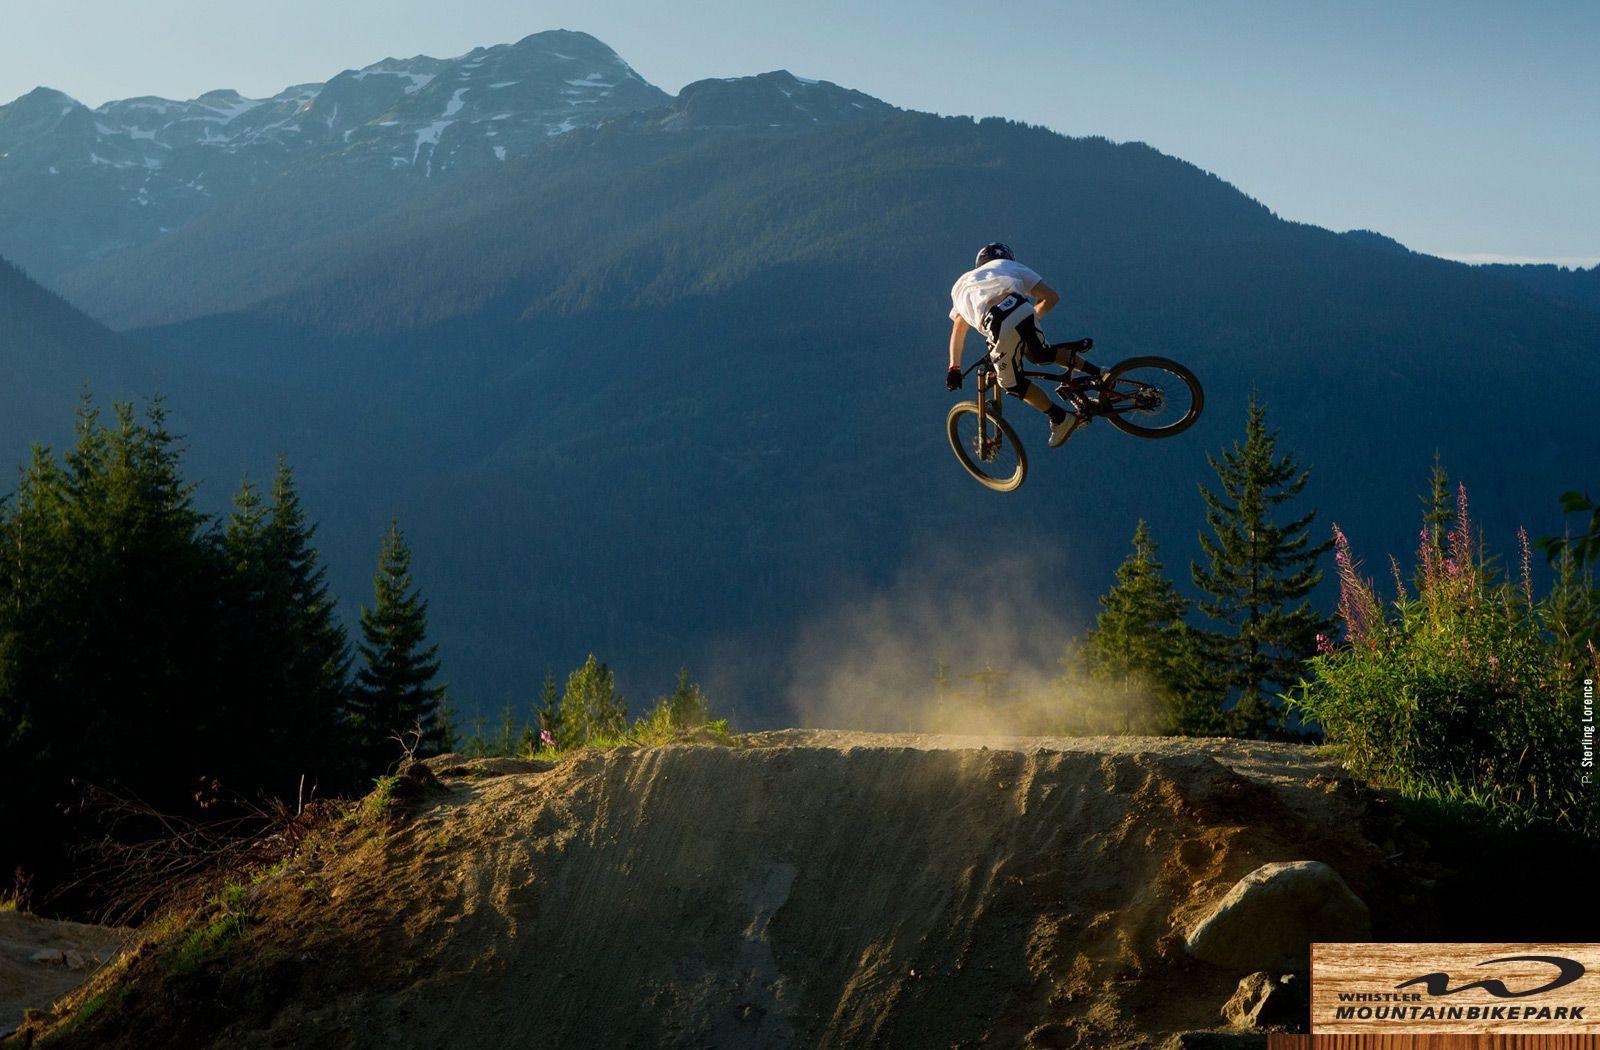 Mountain Bike Trail Wallpapers Top Free Mountain Bike